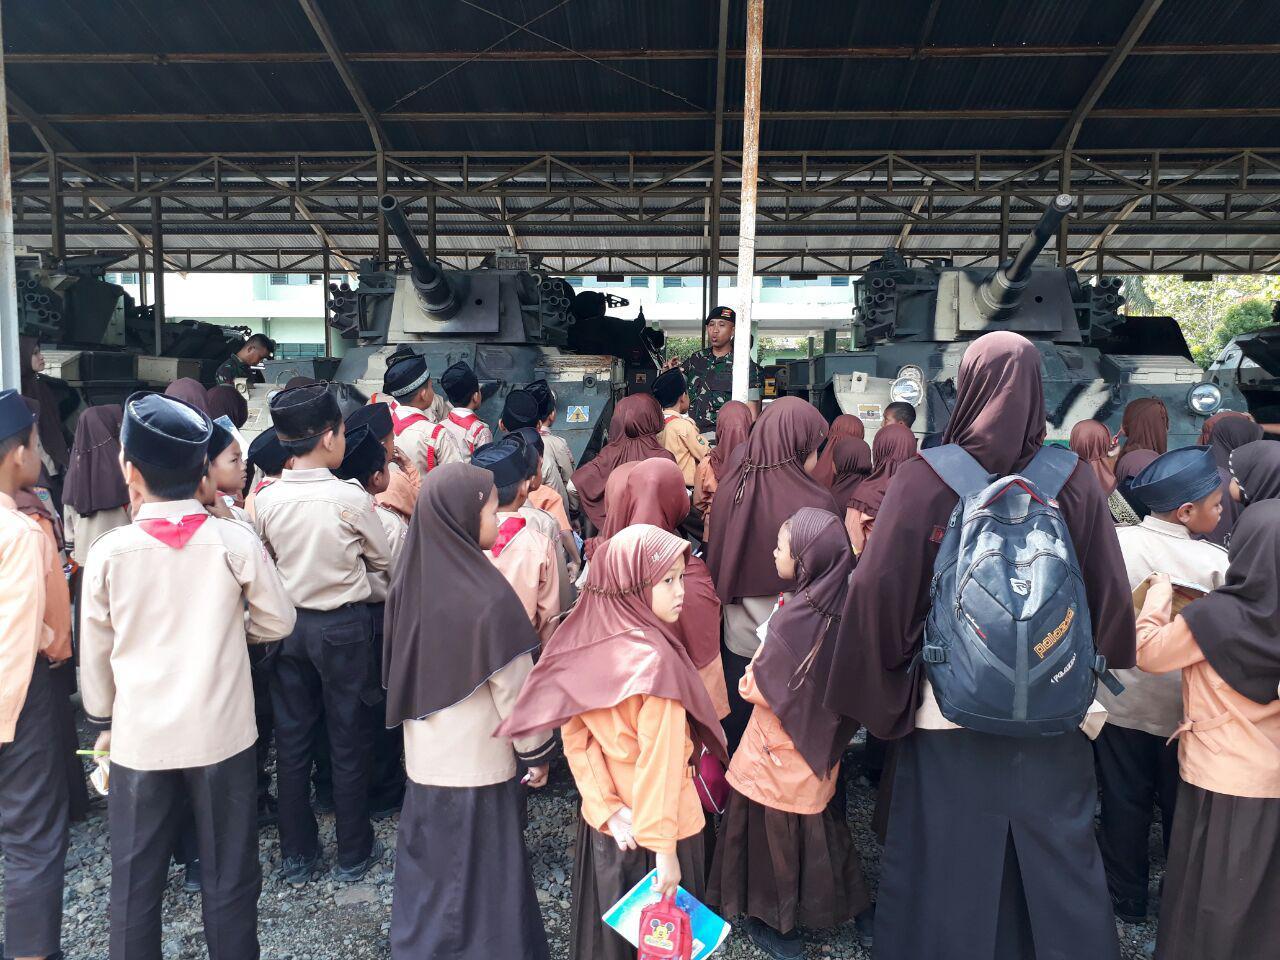 Tumbuhkan Rasa Cinta Tanah Air SD Al-Ikhlas Binjai, kunjungi Yonkav 6/NK